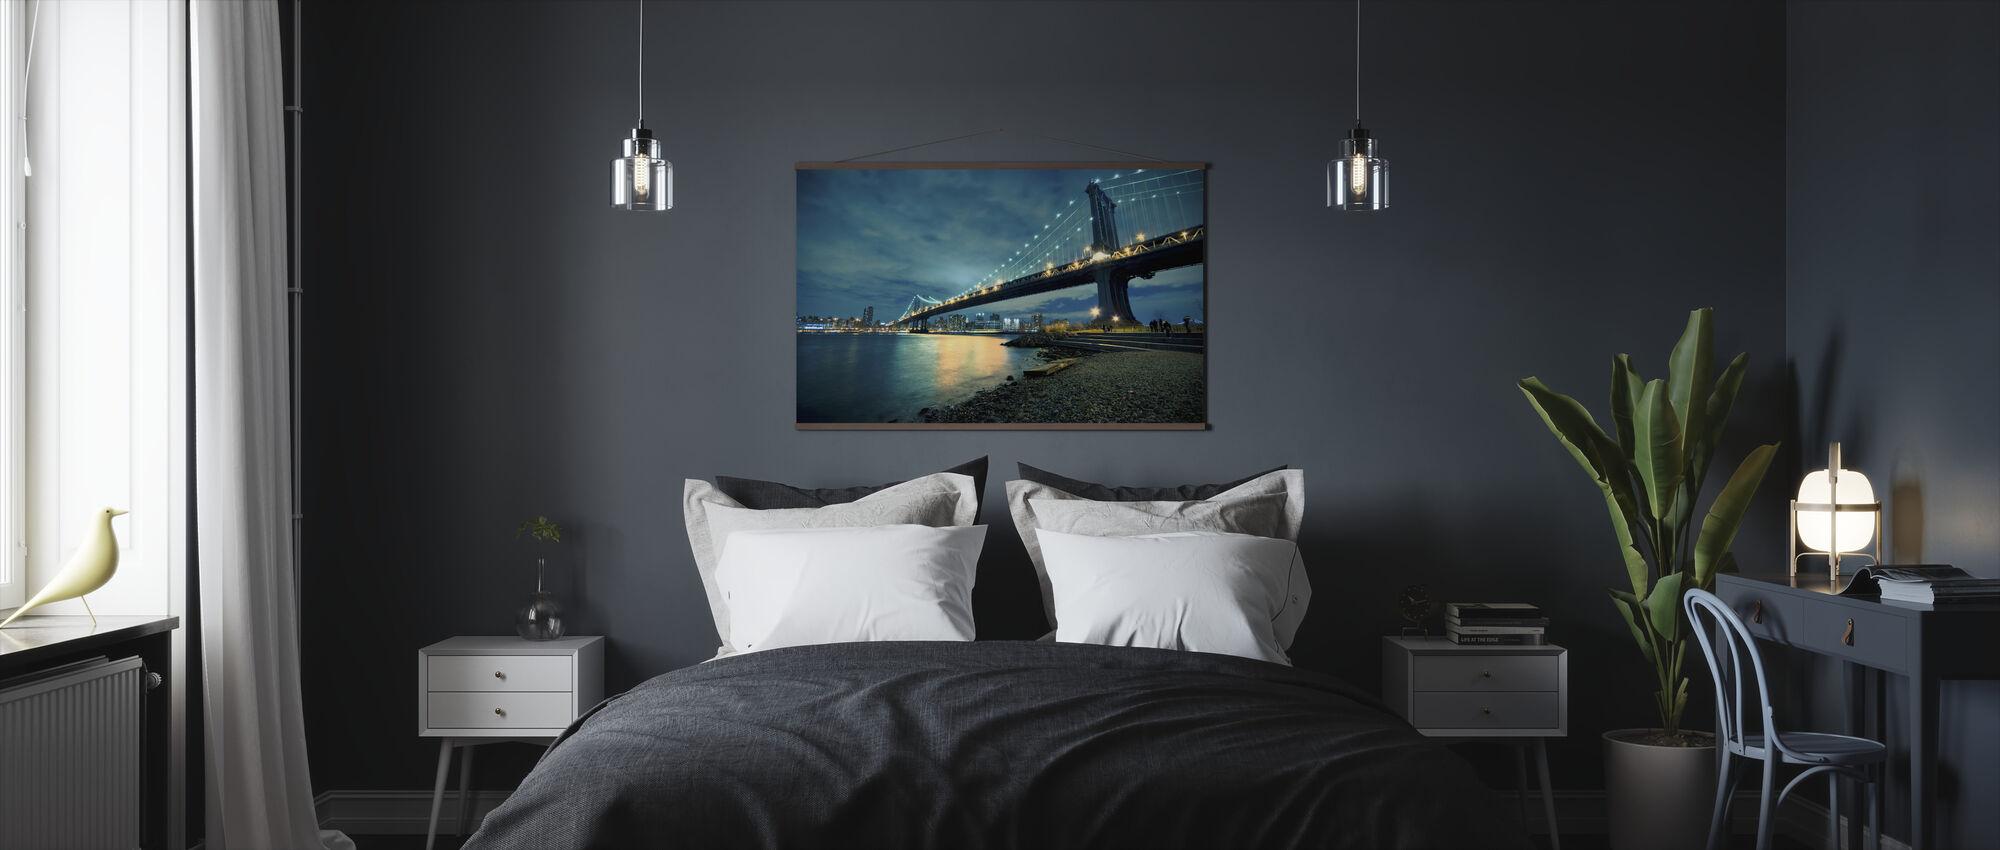 Manhattan Bridge Glowing at Night - Poster - Bedroom